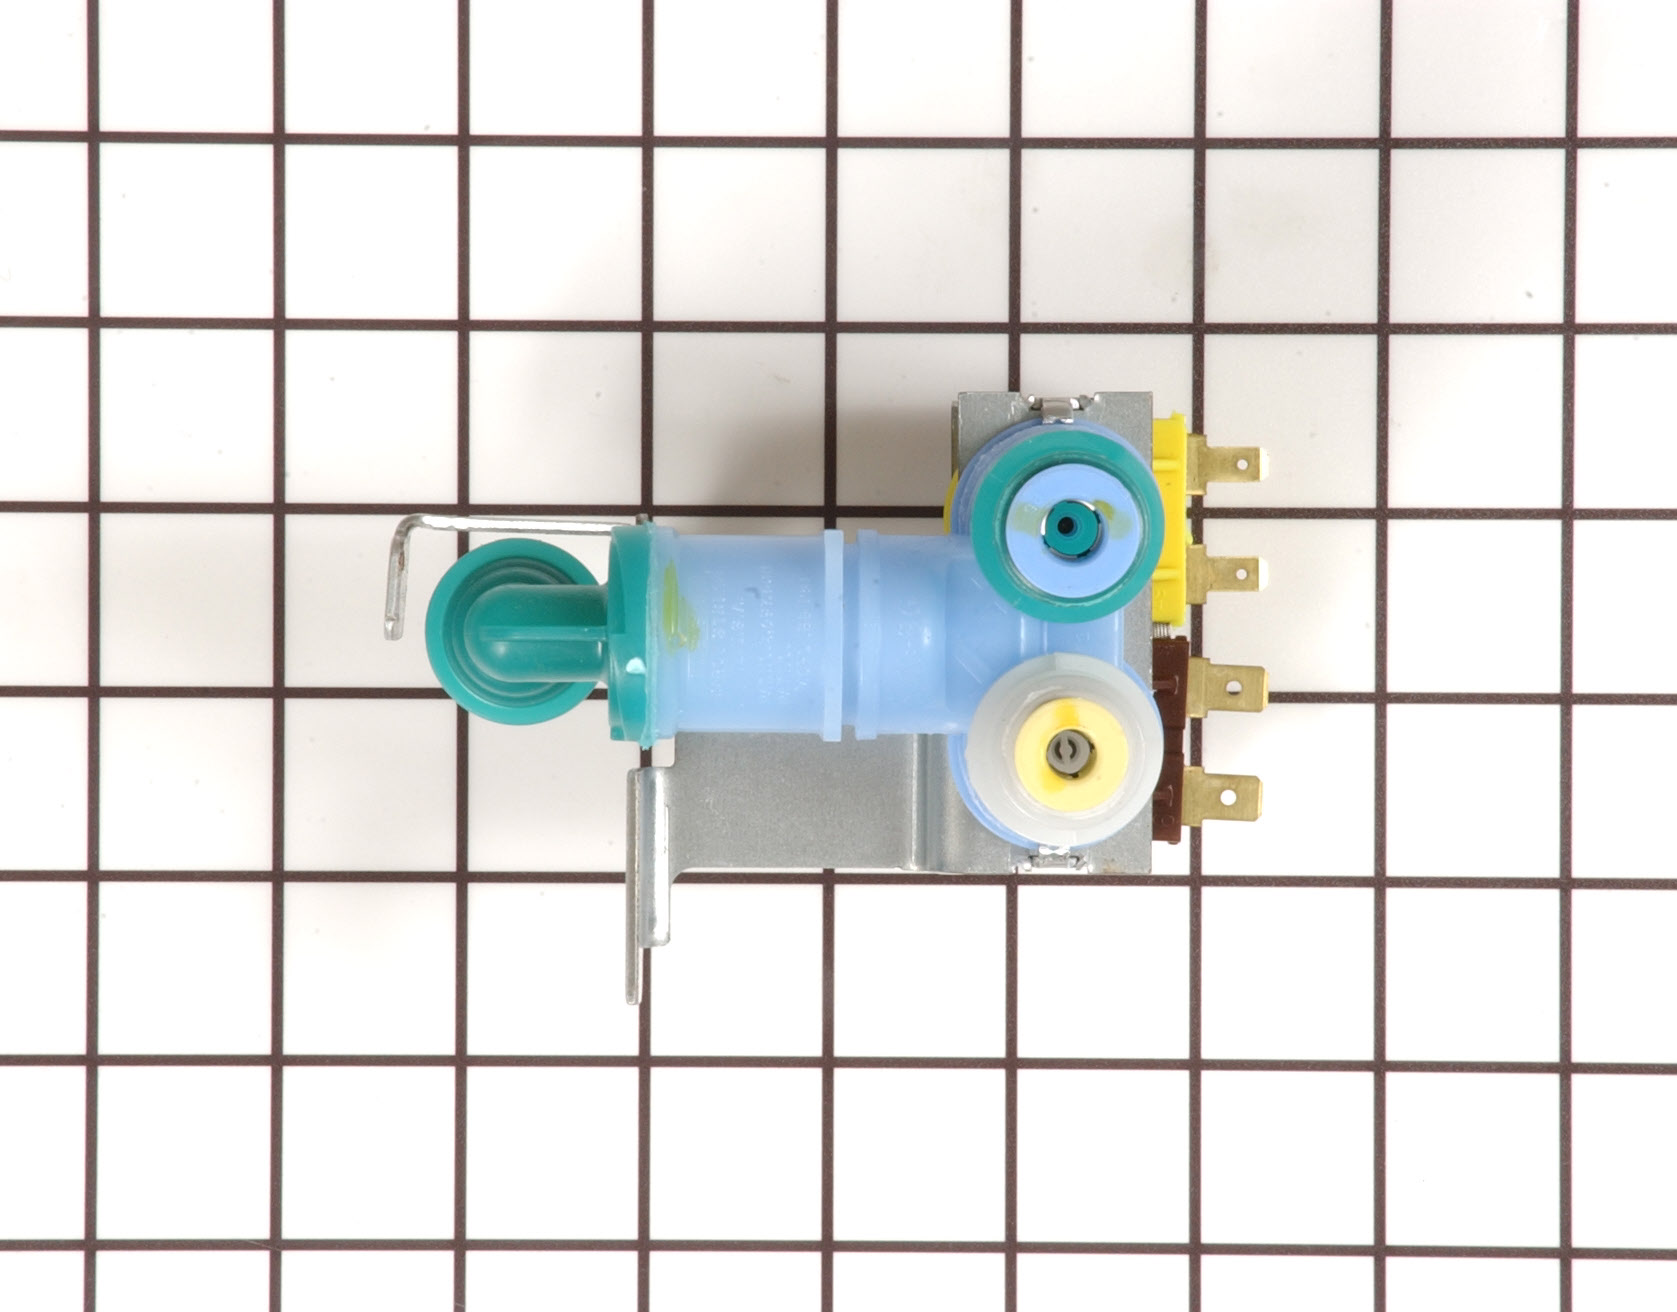 WP67006531 KitchenAid Refrigerator Part -Water Inlet Valve